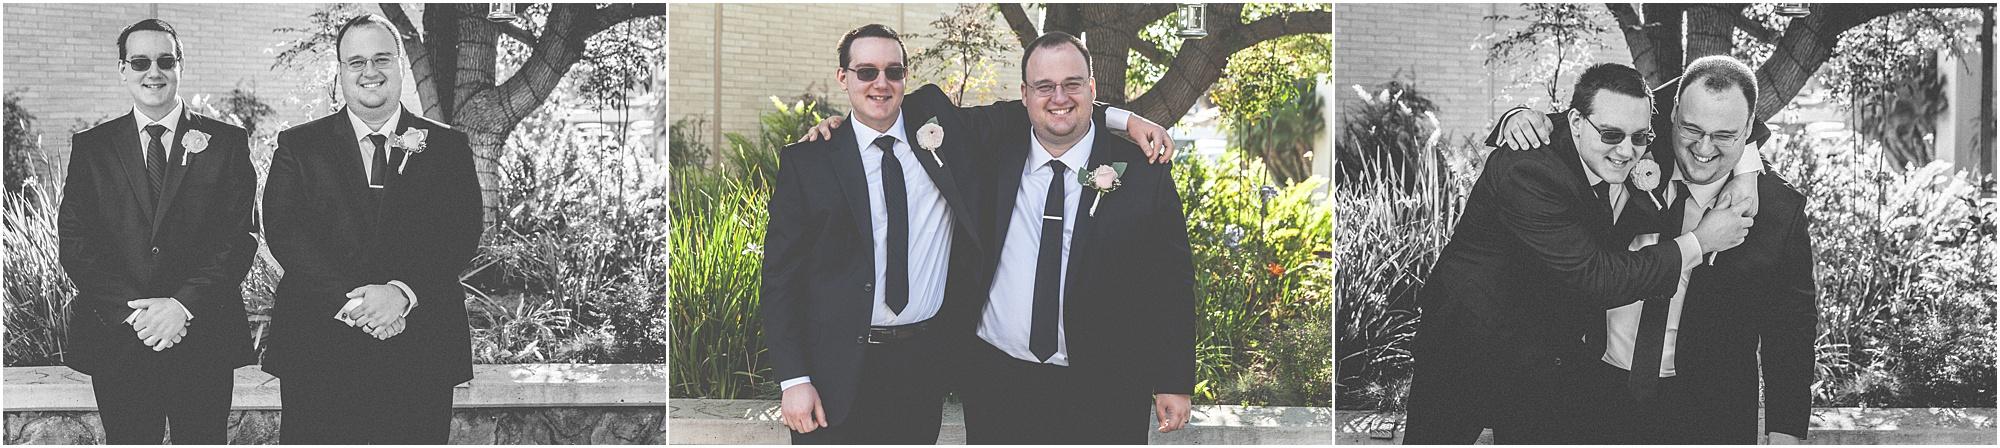 Lindsey & David Wedding Stomps 27.jpg